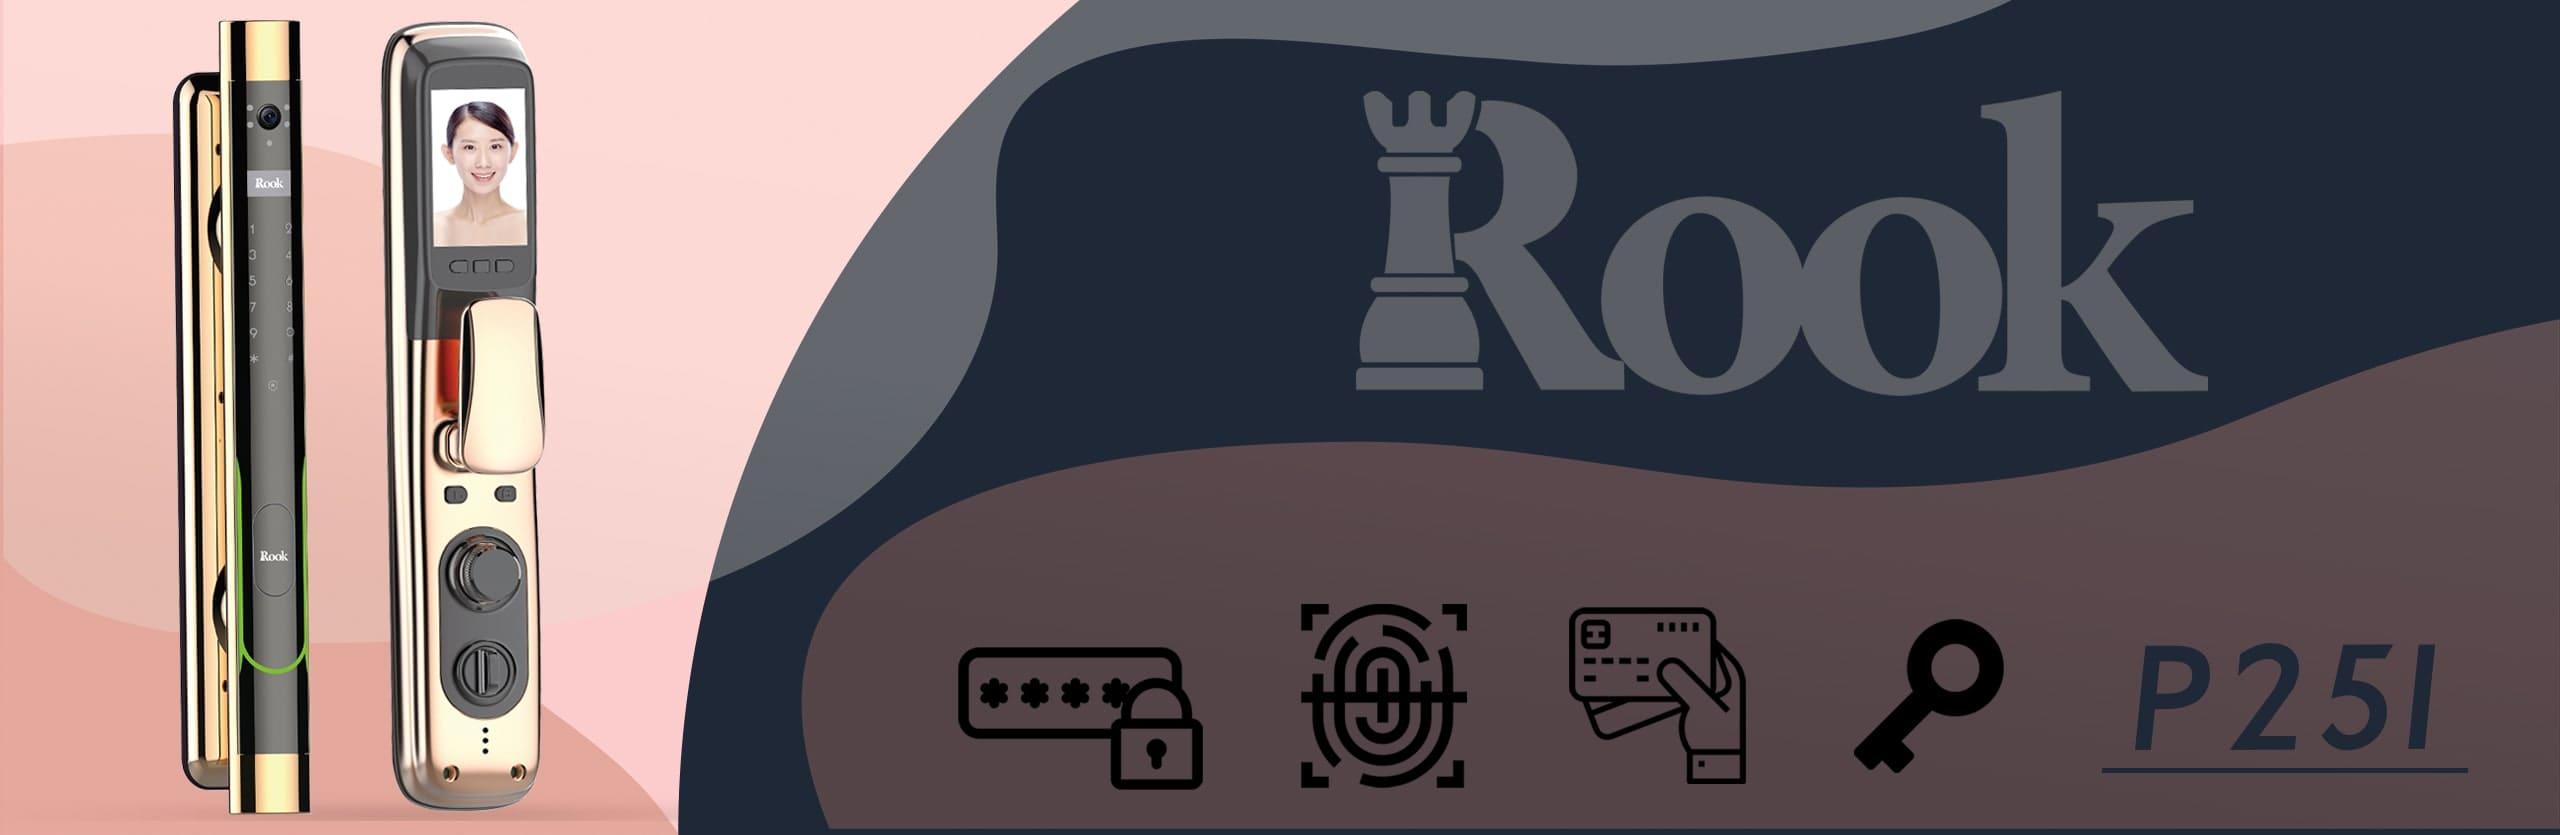 قفل-هوشمند-روک-p251